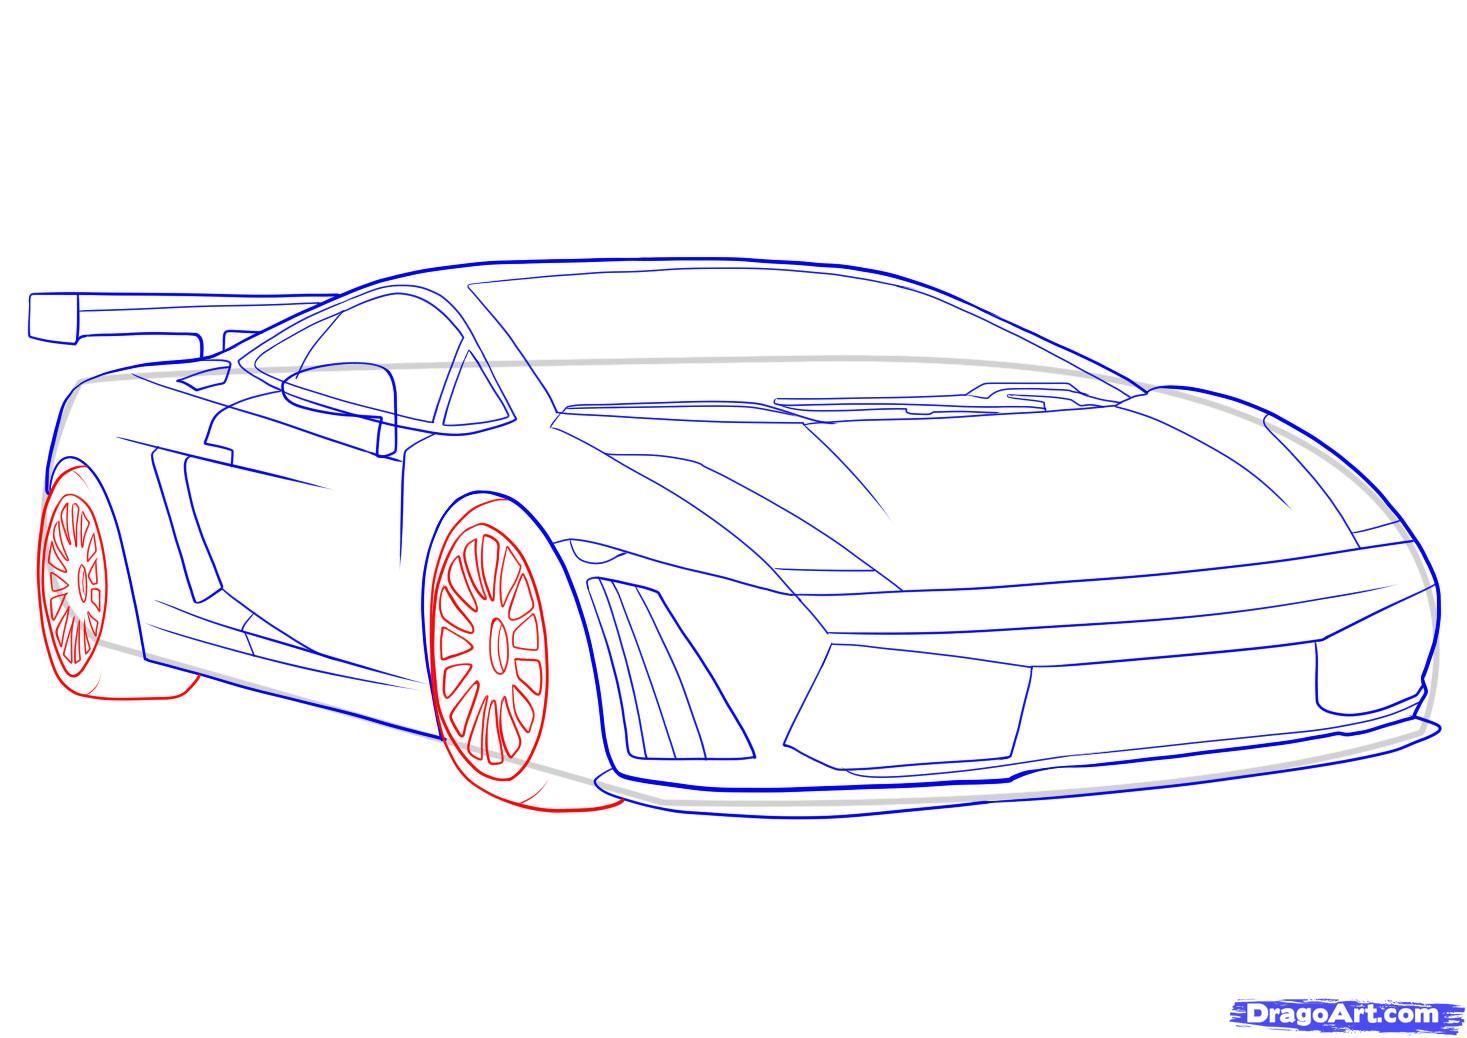 1467x1038 How To Draw Lamborghini Aventador A Car Easy Step By Step Home